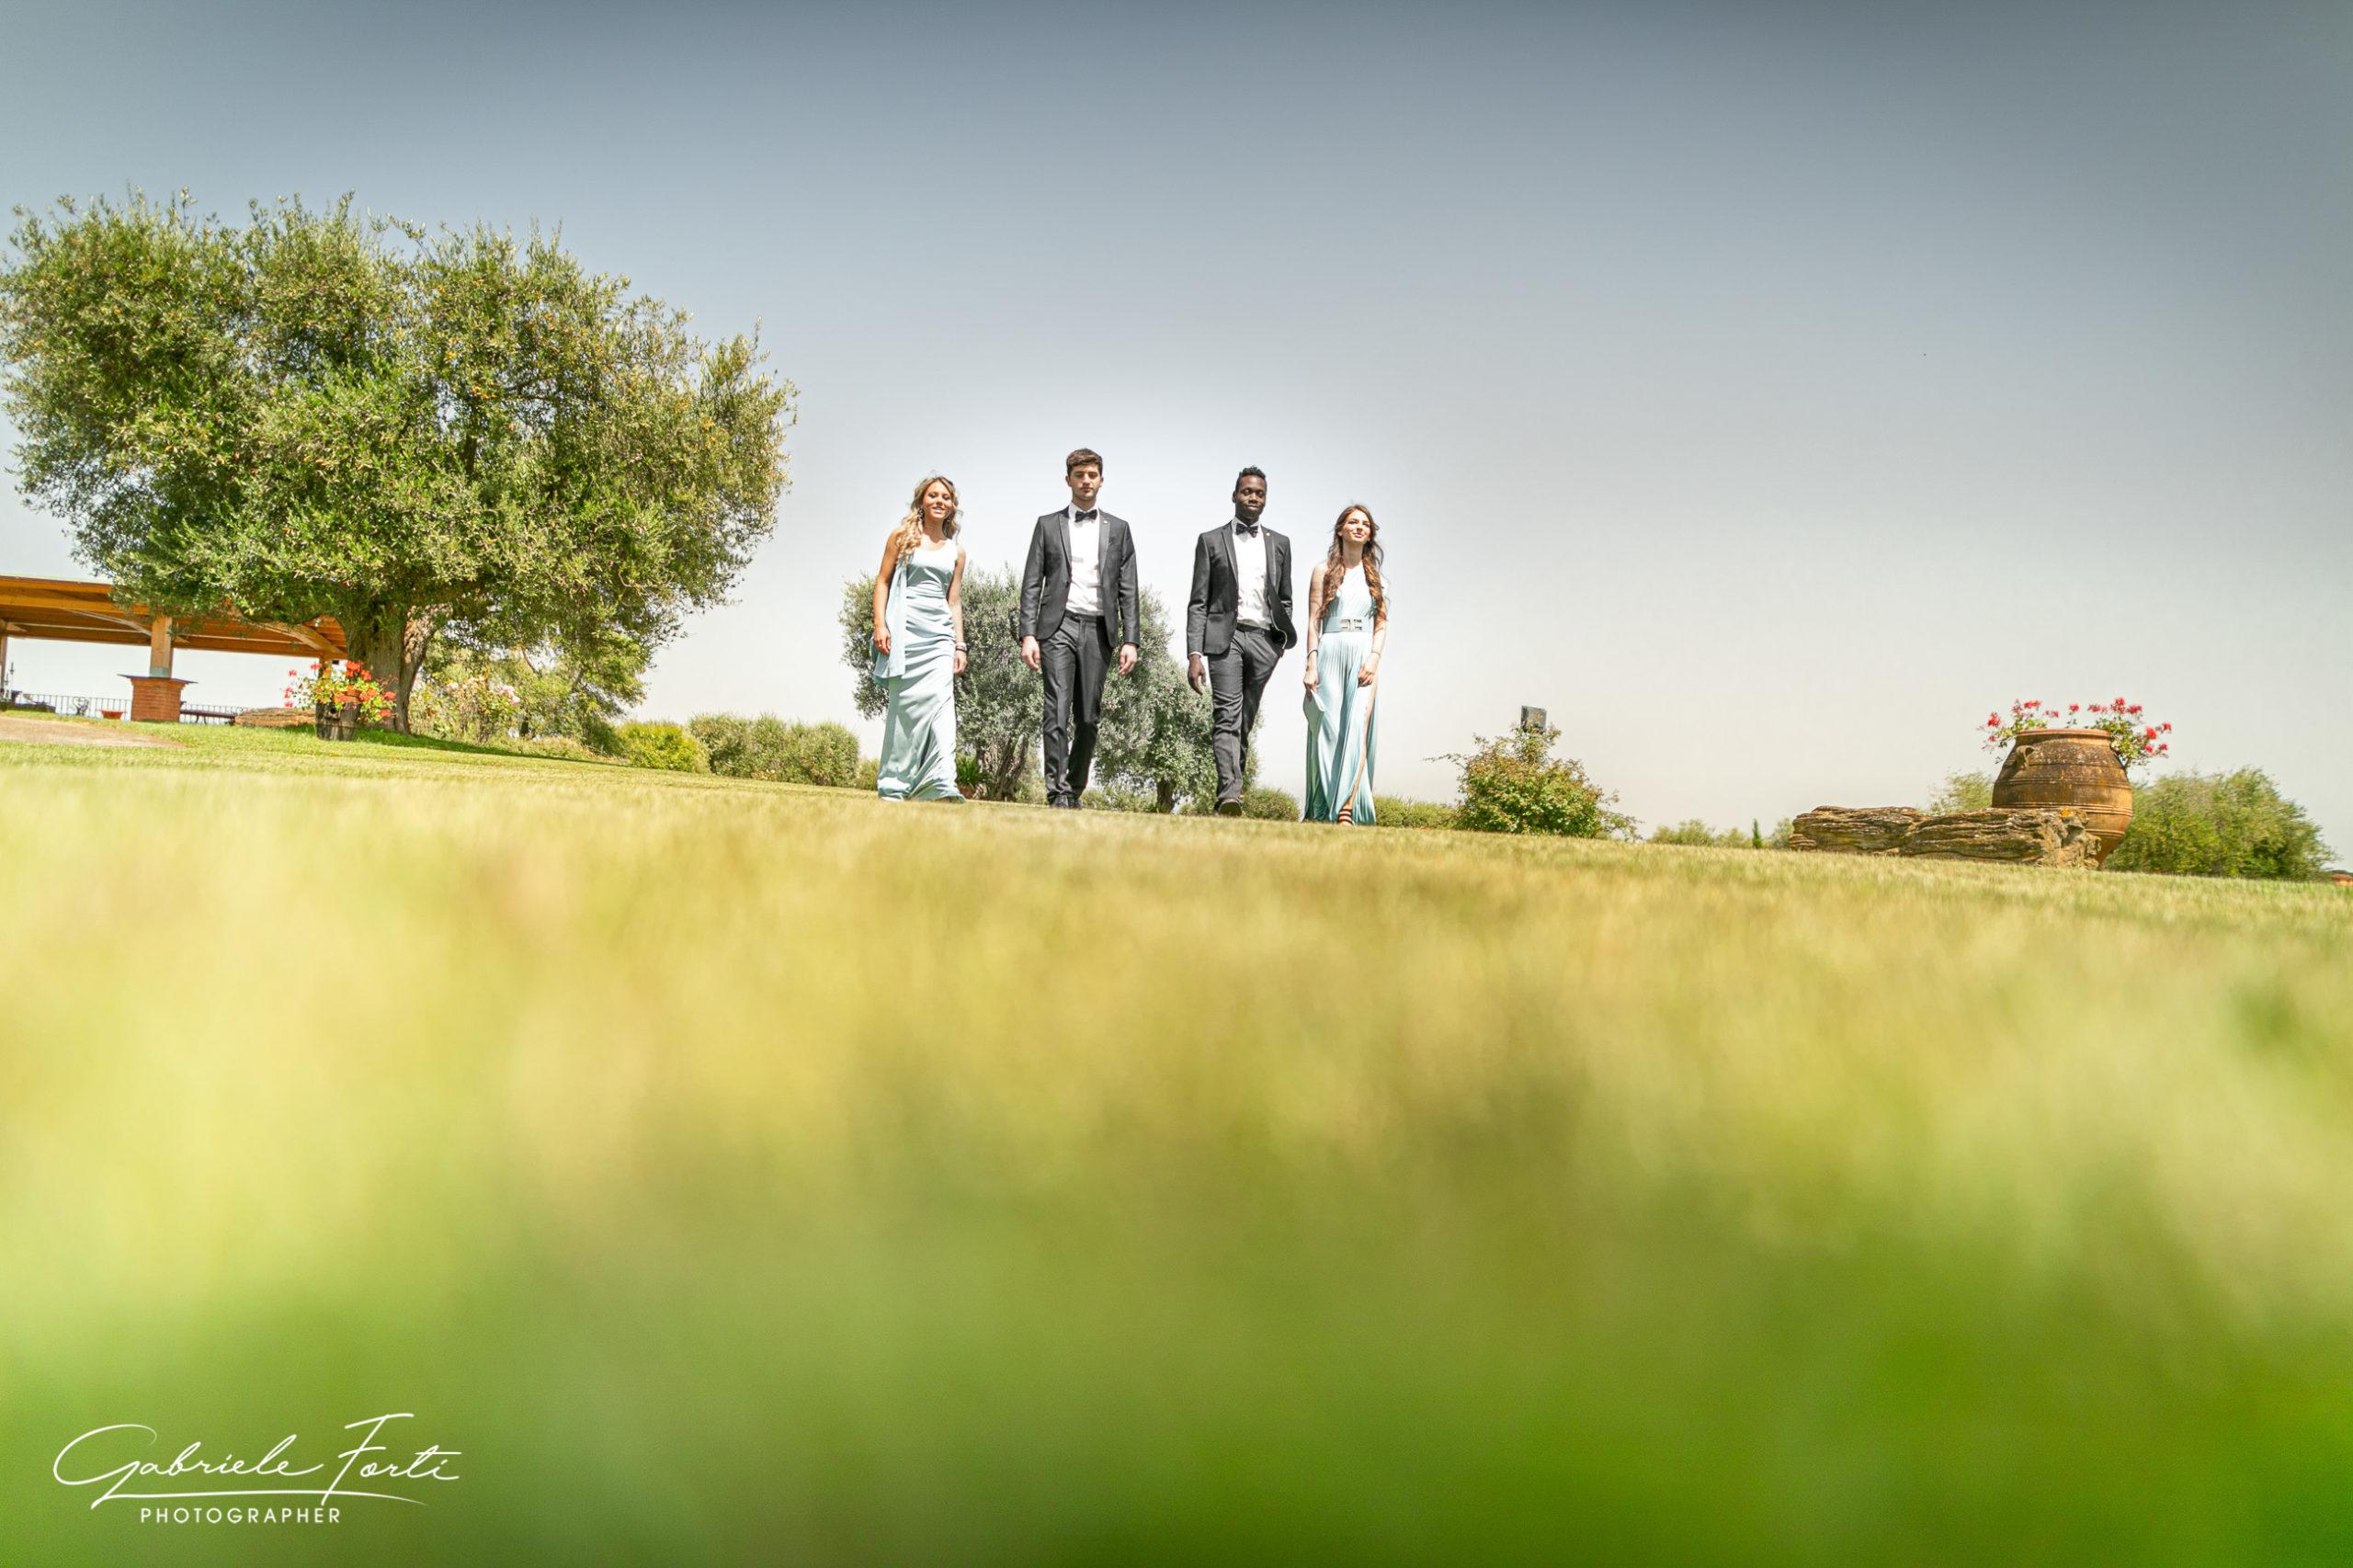 wedding-siena-val-d'orcoa-la-rimbecca-photographer-foto-forti-gabriele-4